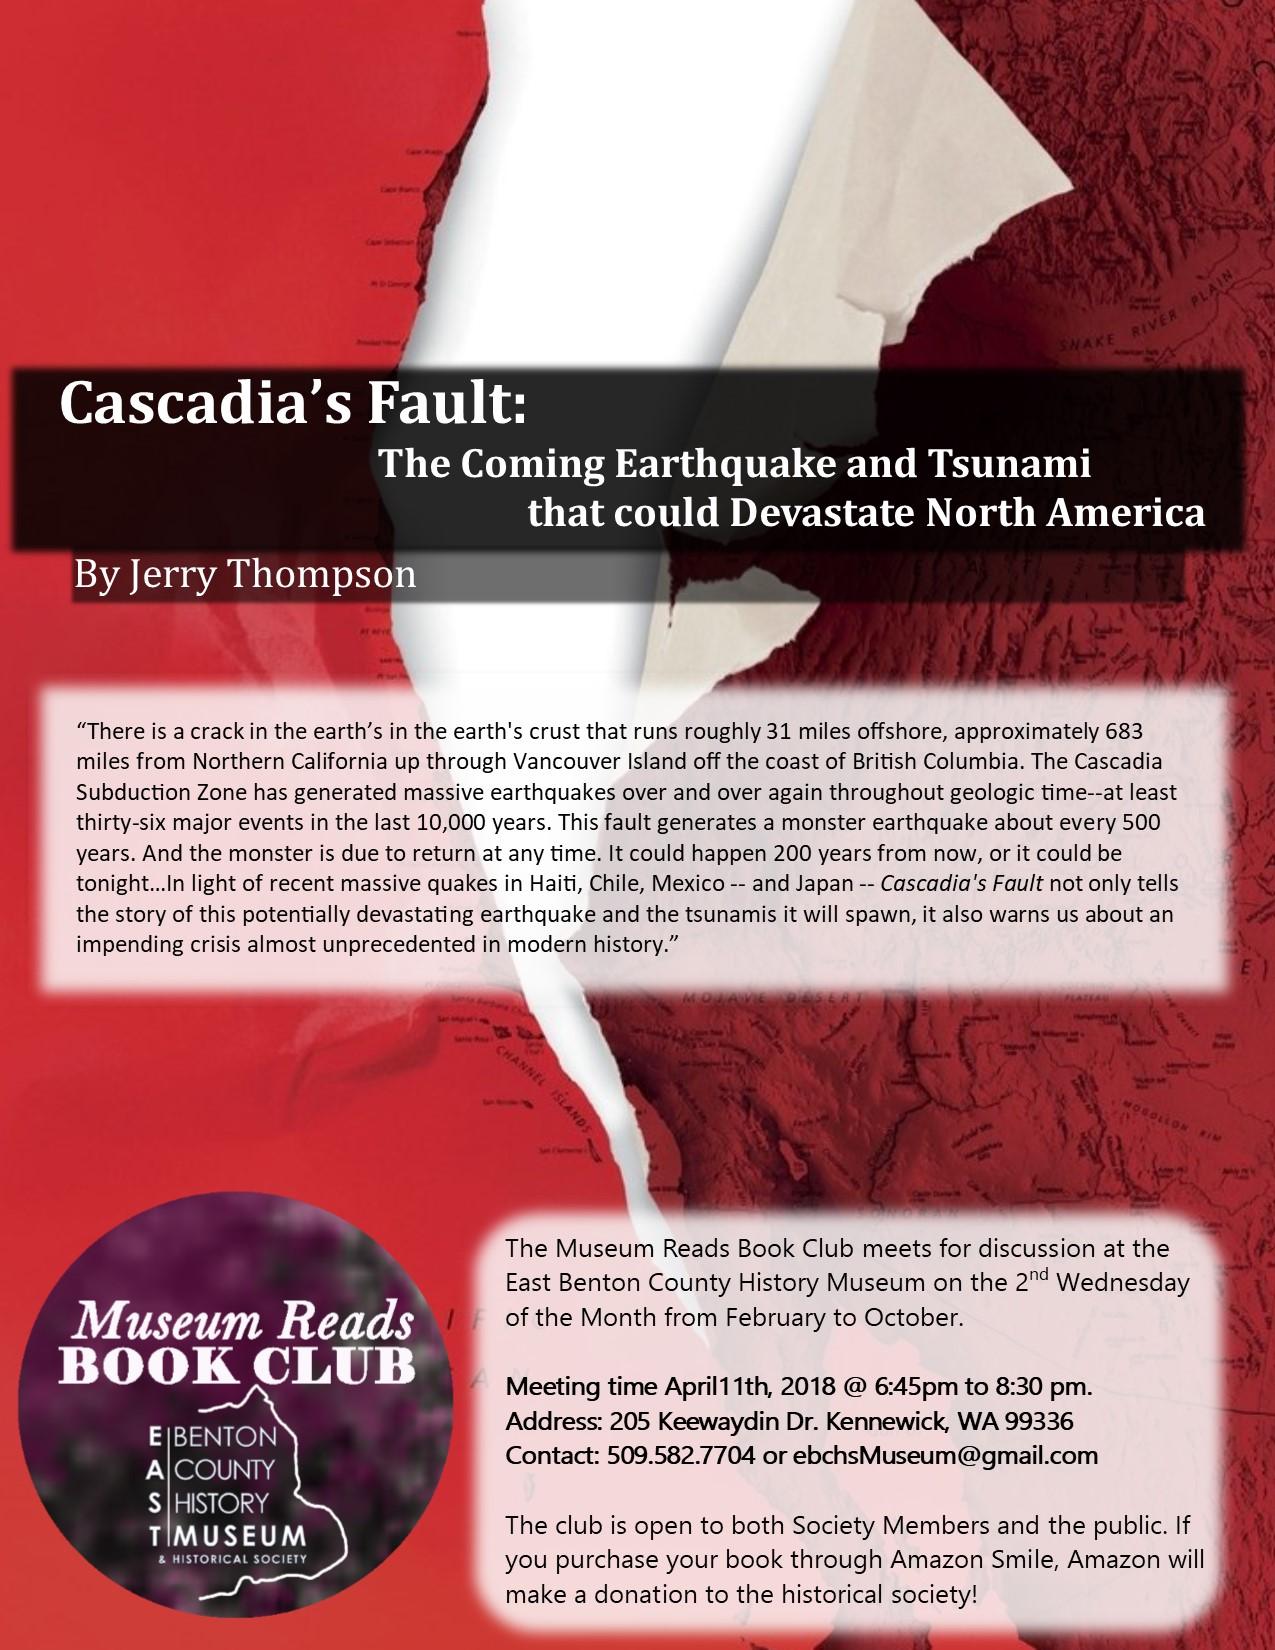 Cascadias fault poster.jpg